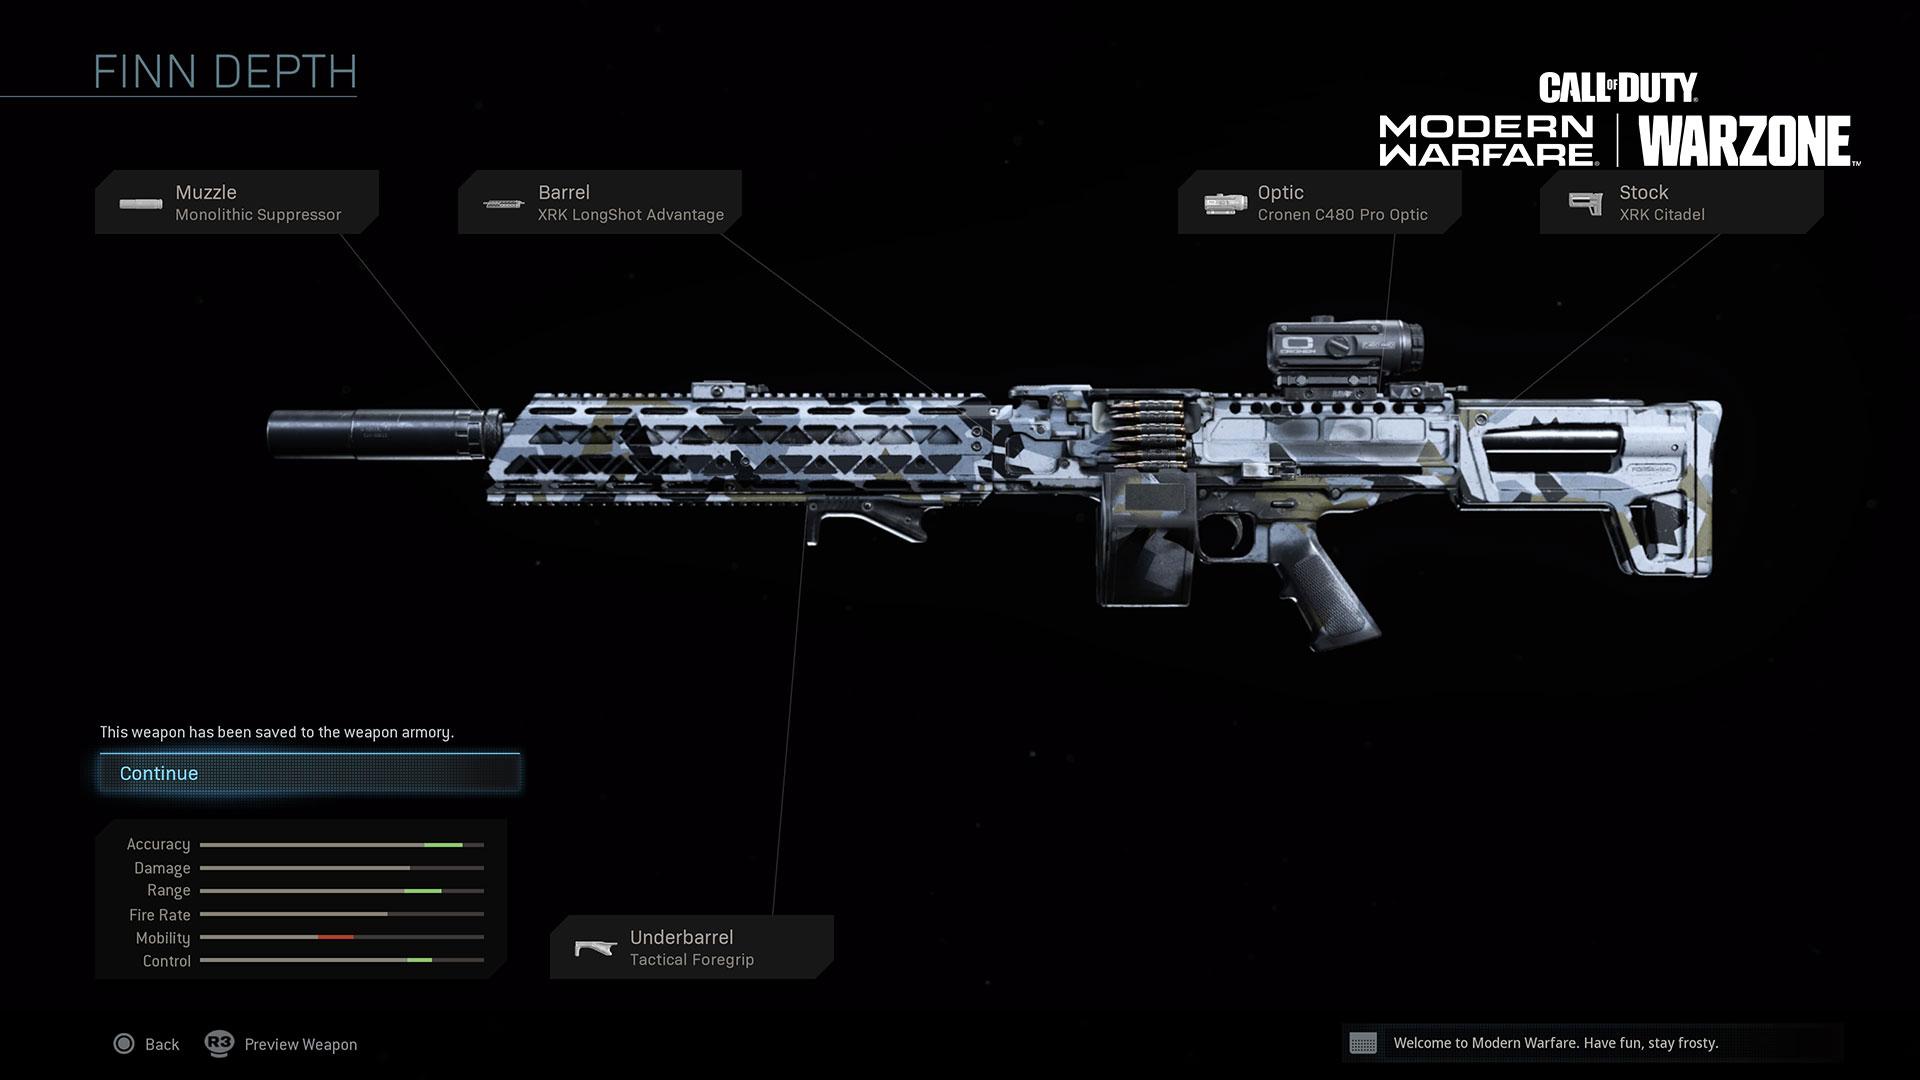 Modern Warfare Weapon Detail Finn Lmg The official subreddit for the game gunsmith! modern warfare weapon detail finn lmg